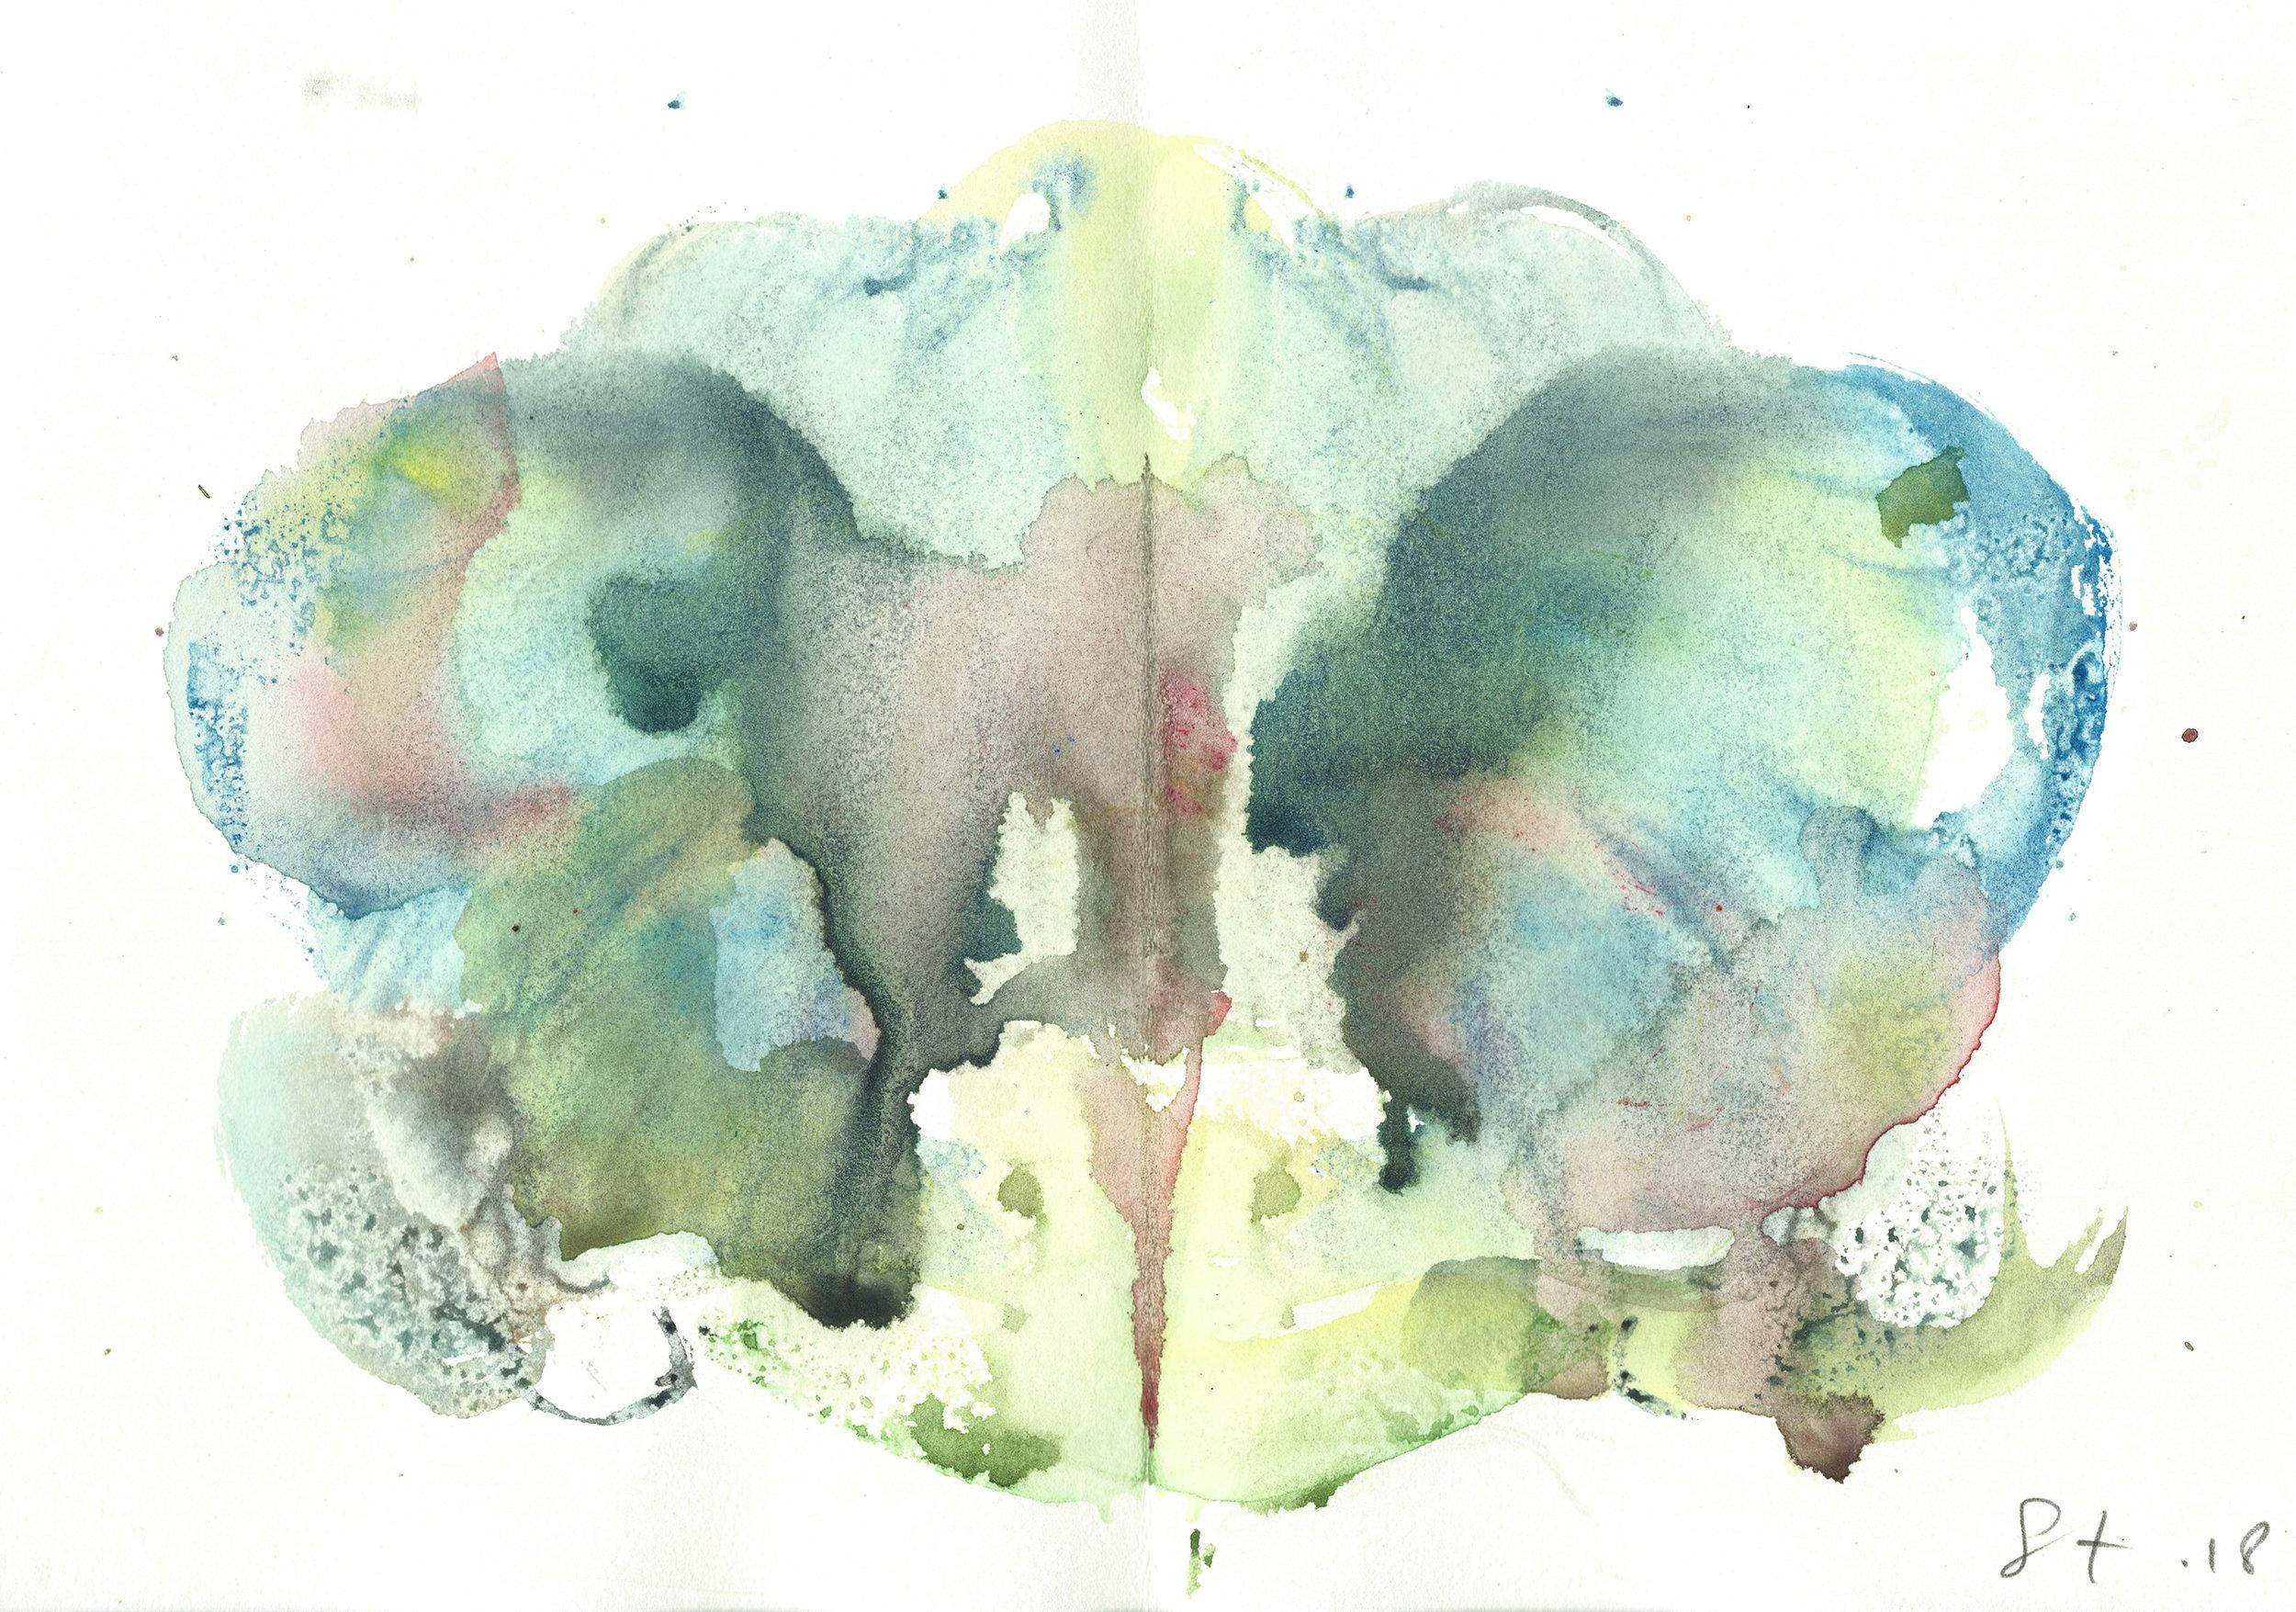 Stephen Thomas, Yoga, Yoga-Svarupa, watercolor 01